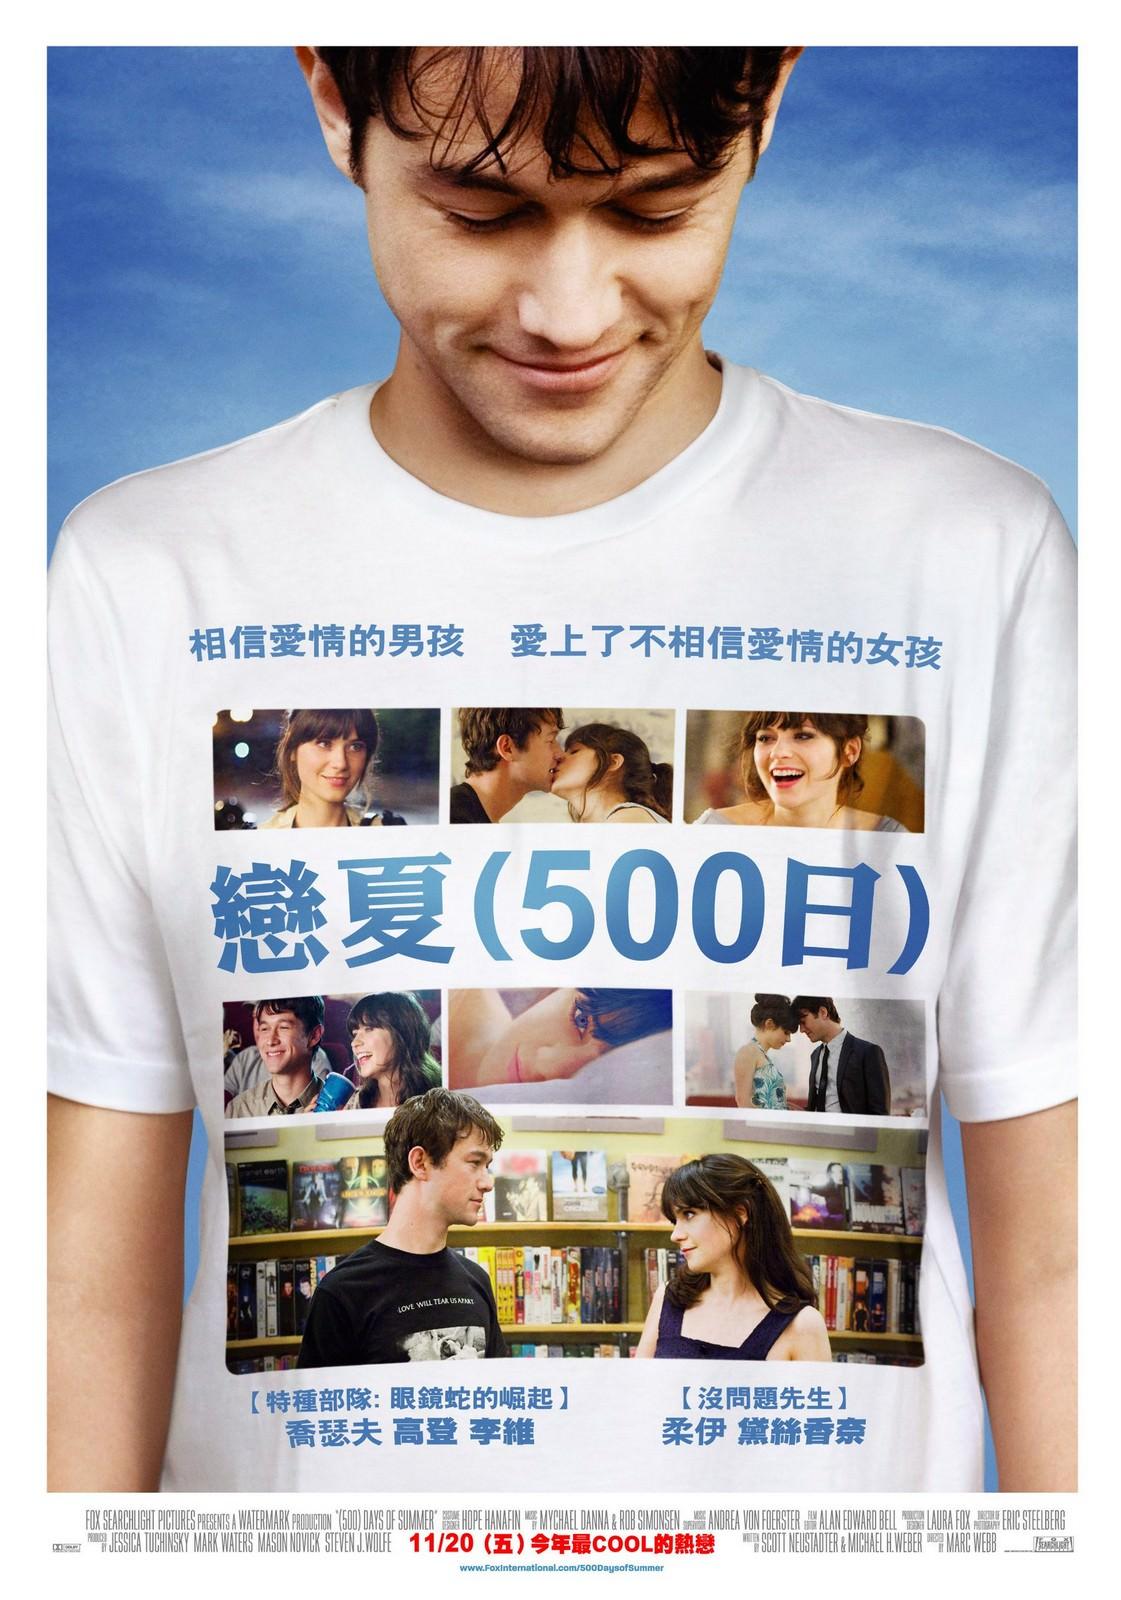 Movie, Days of Summer(美國) / 戀夏500日(台) / 心跳500天(港) / 和莎莫的500天(網), 電影海報, 台灣